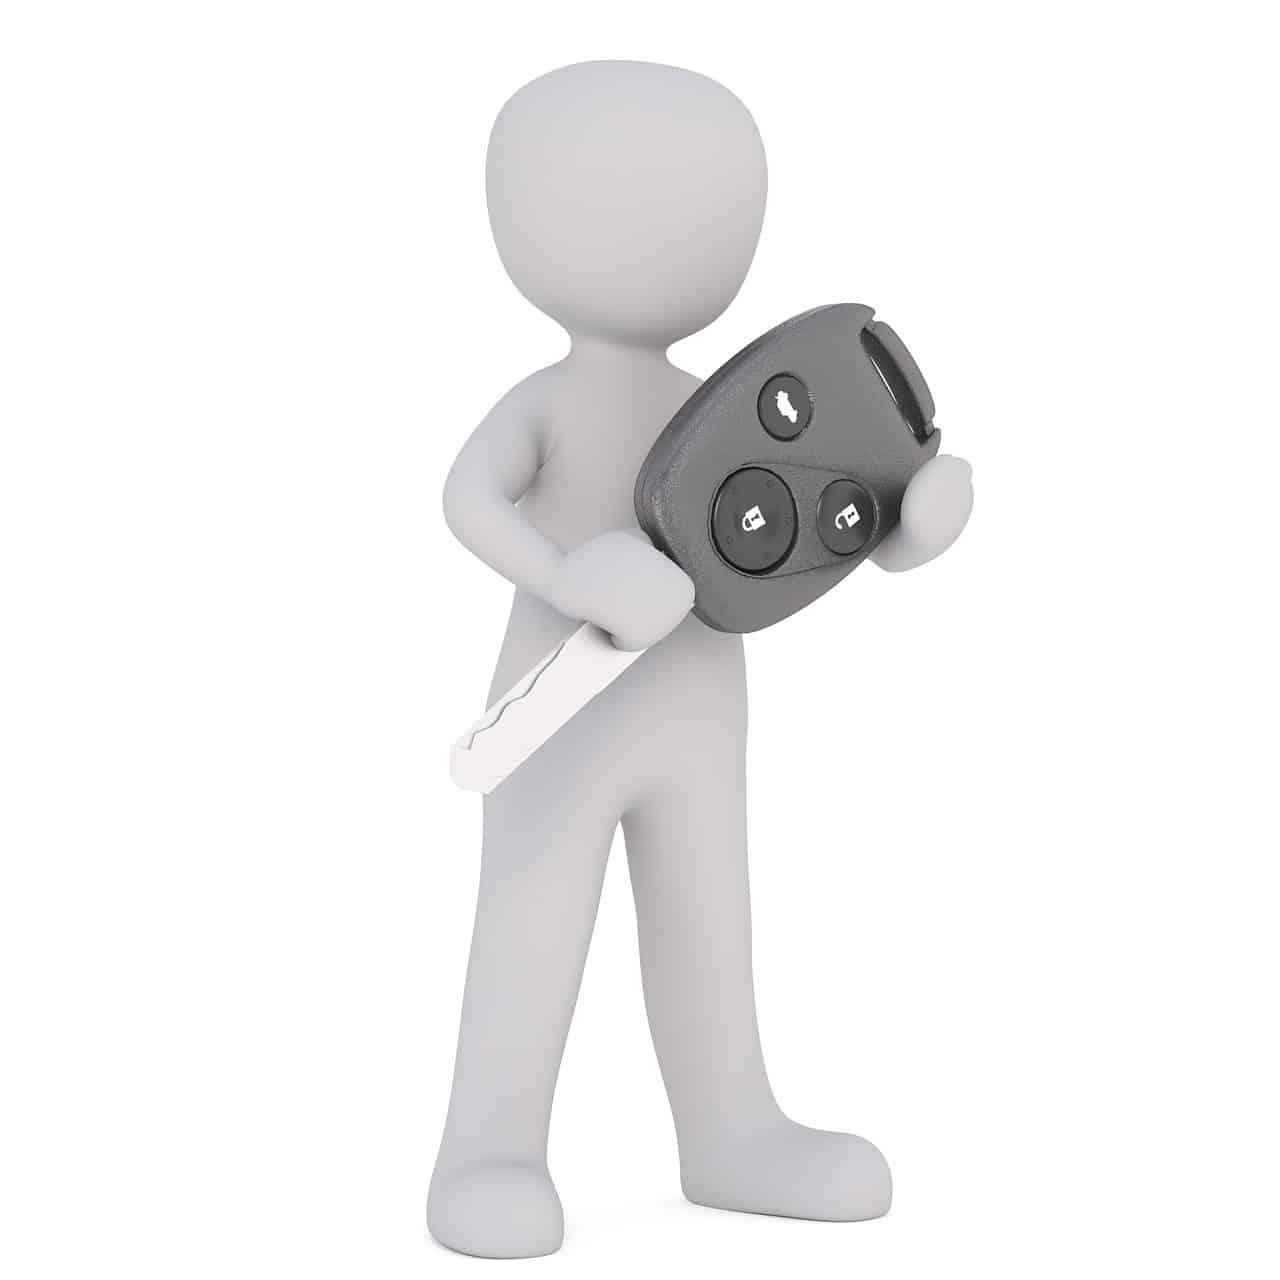 Buchbinder data leak - leak at the car rental company